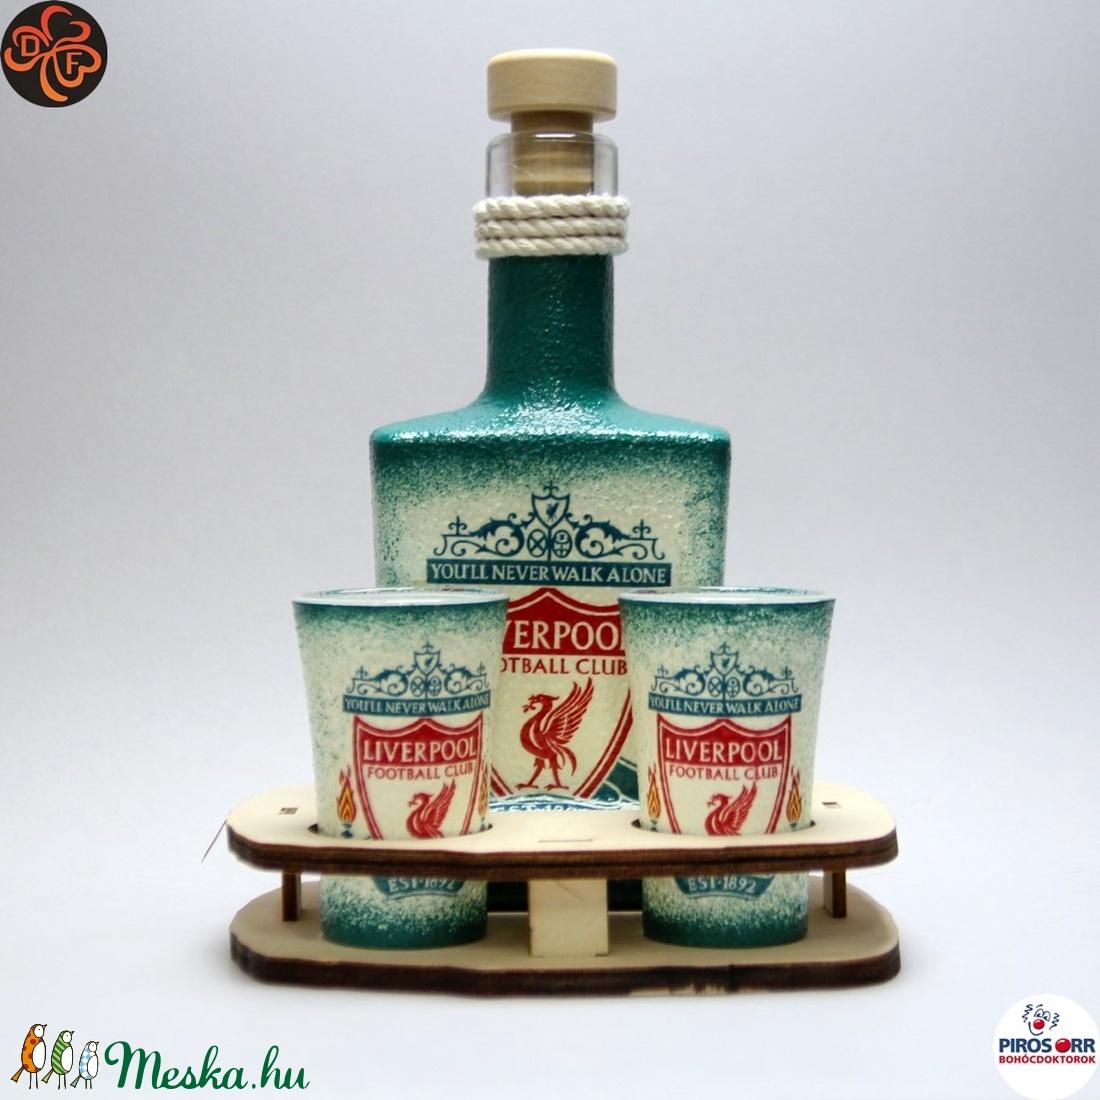 LIVERPOOL italos szett ; Liverpool szurkolóknak (decorfantasy) - Meska.hu